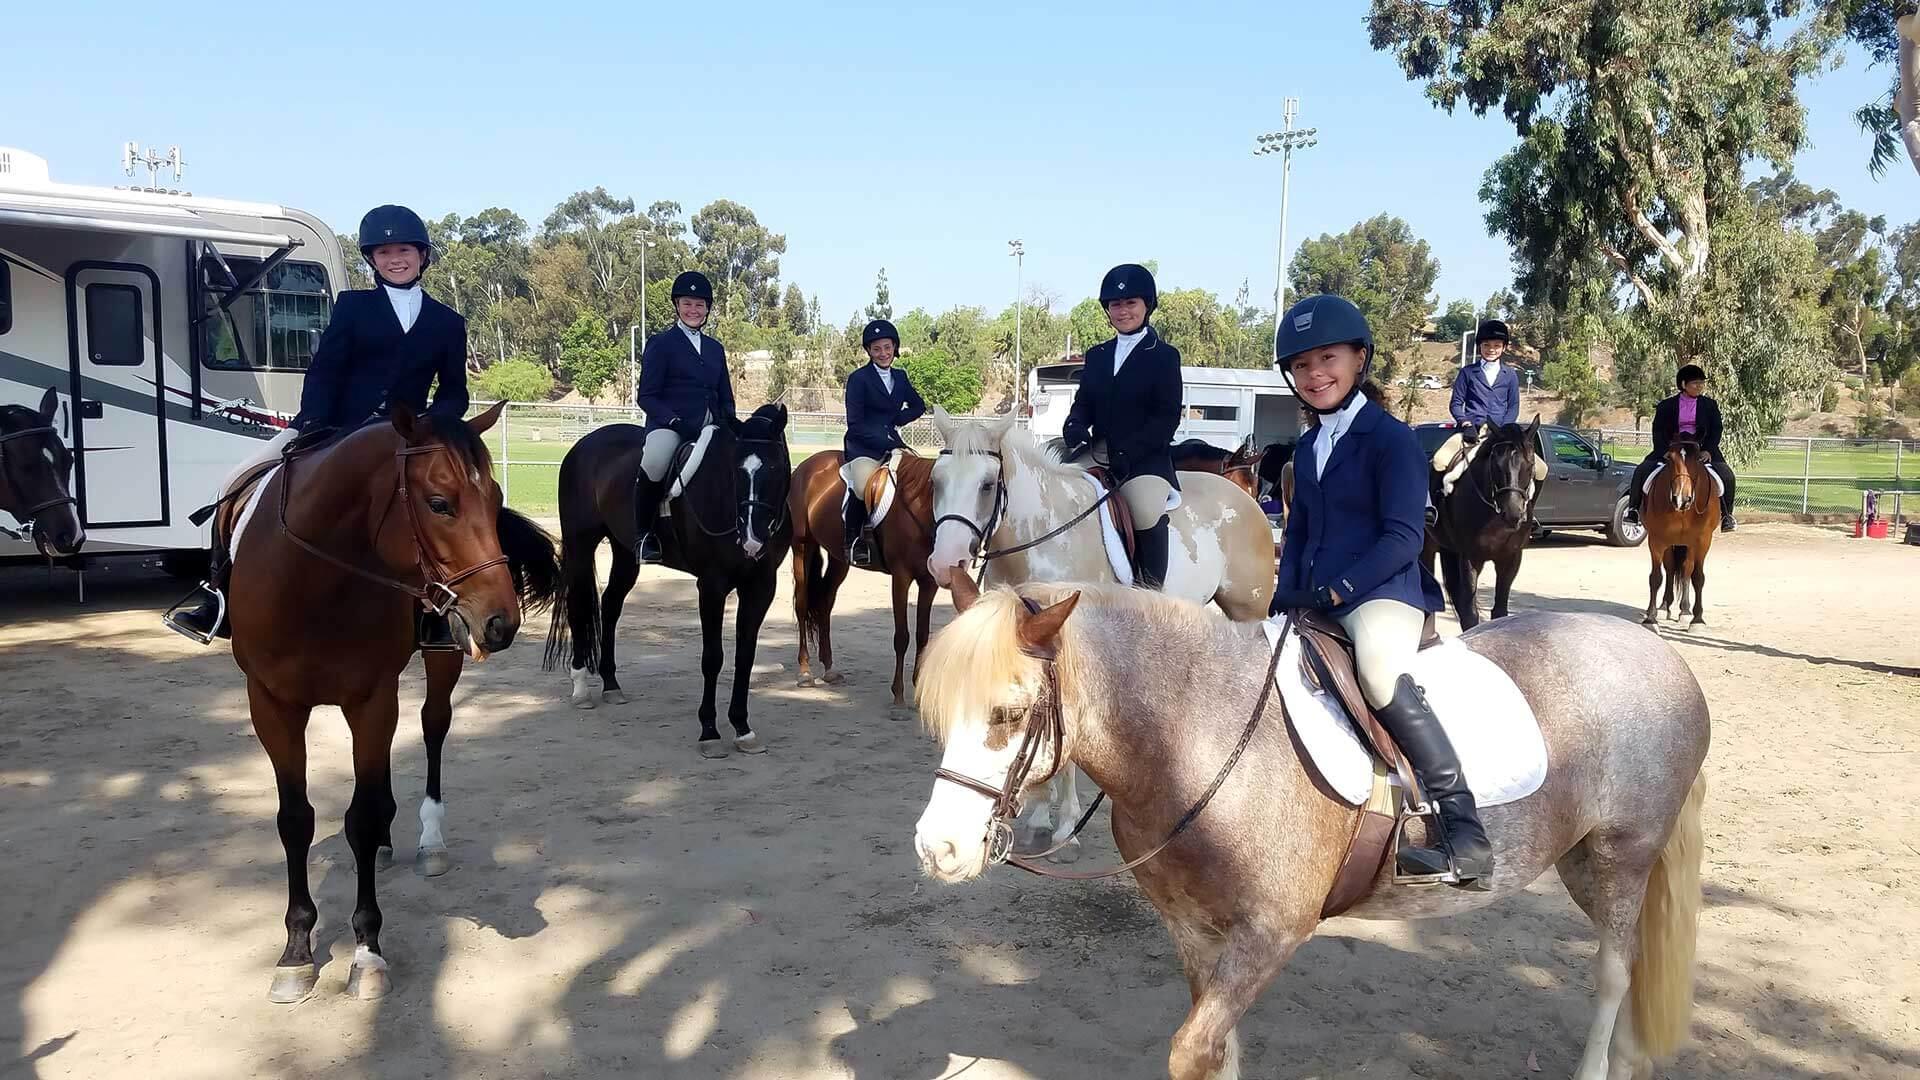 sunnyside-saddle-club-horse-shows-bonita-hero